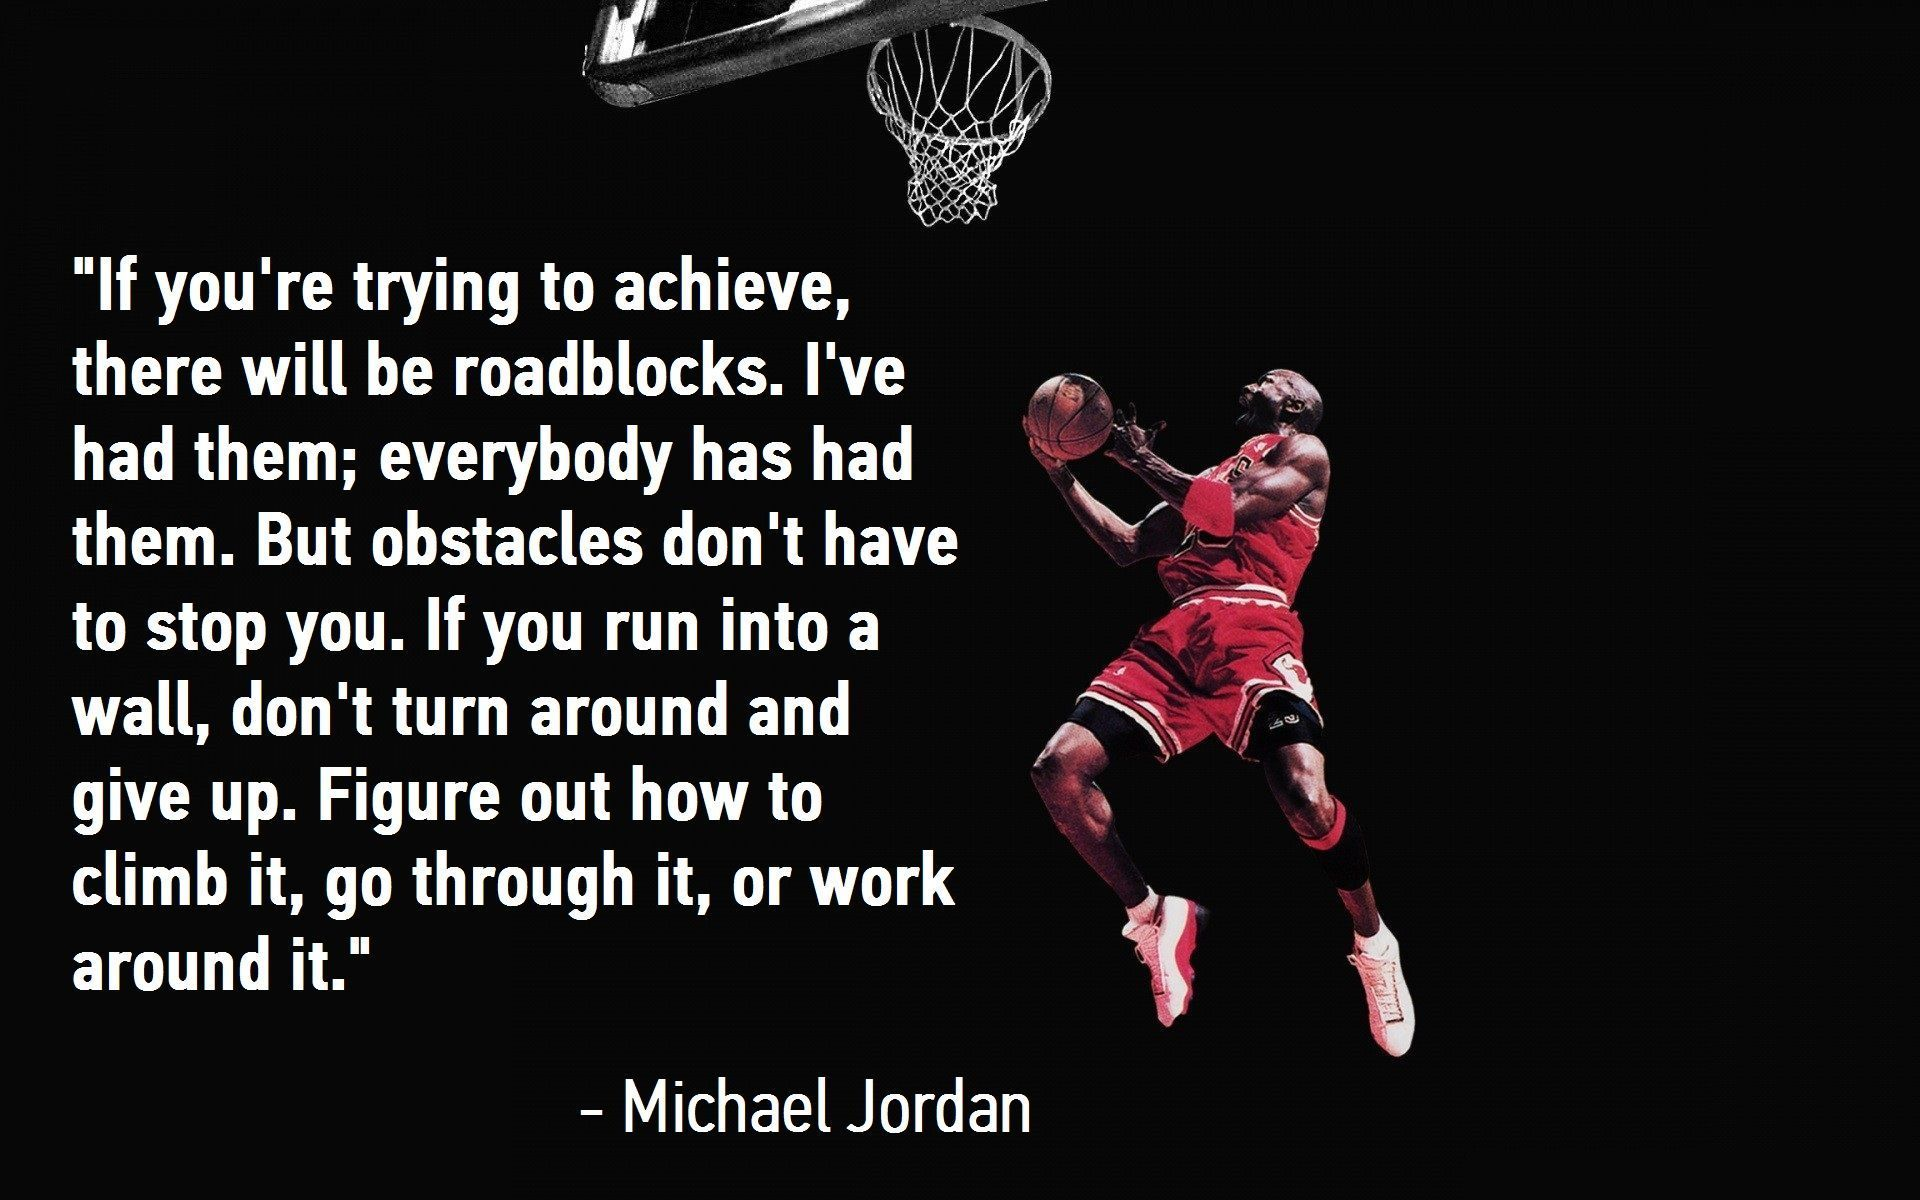 Michael Jordan Quotes Wallpaper Mobile Vbv Michael Jordan Quotes Jordan Quotes Inspirational Quotes Pictures